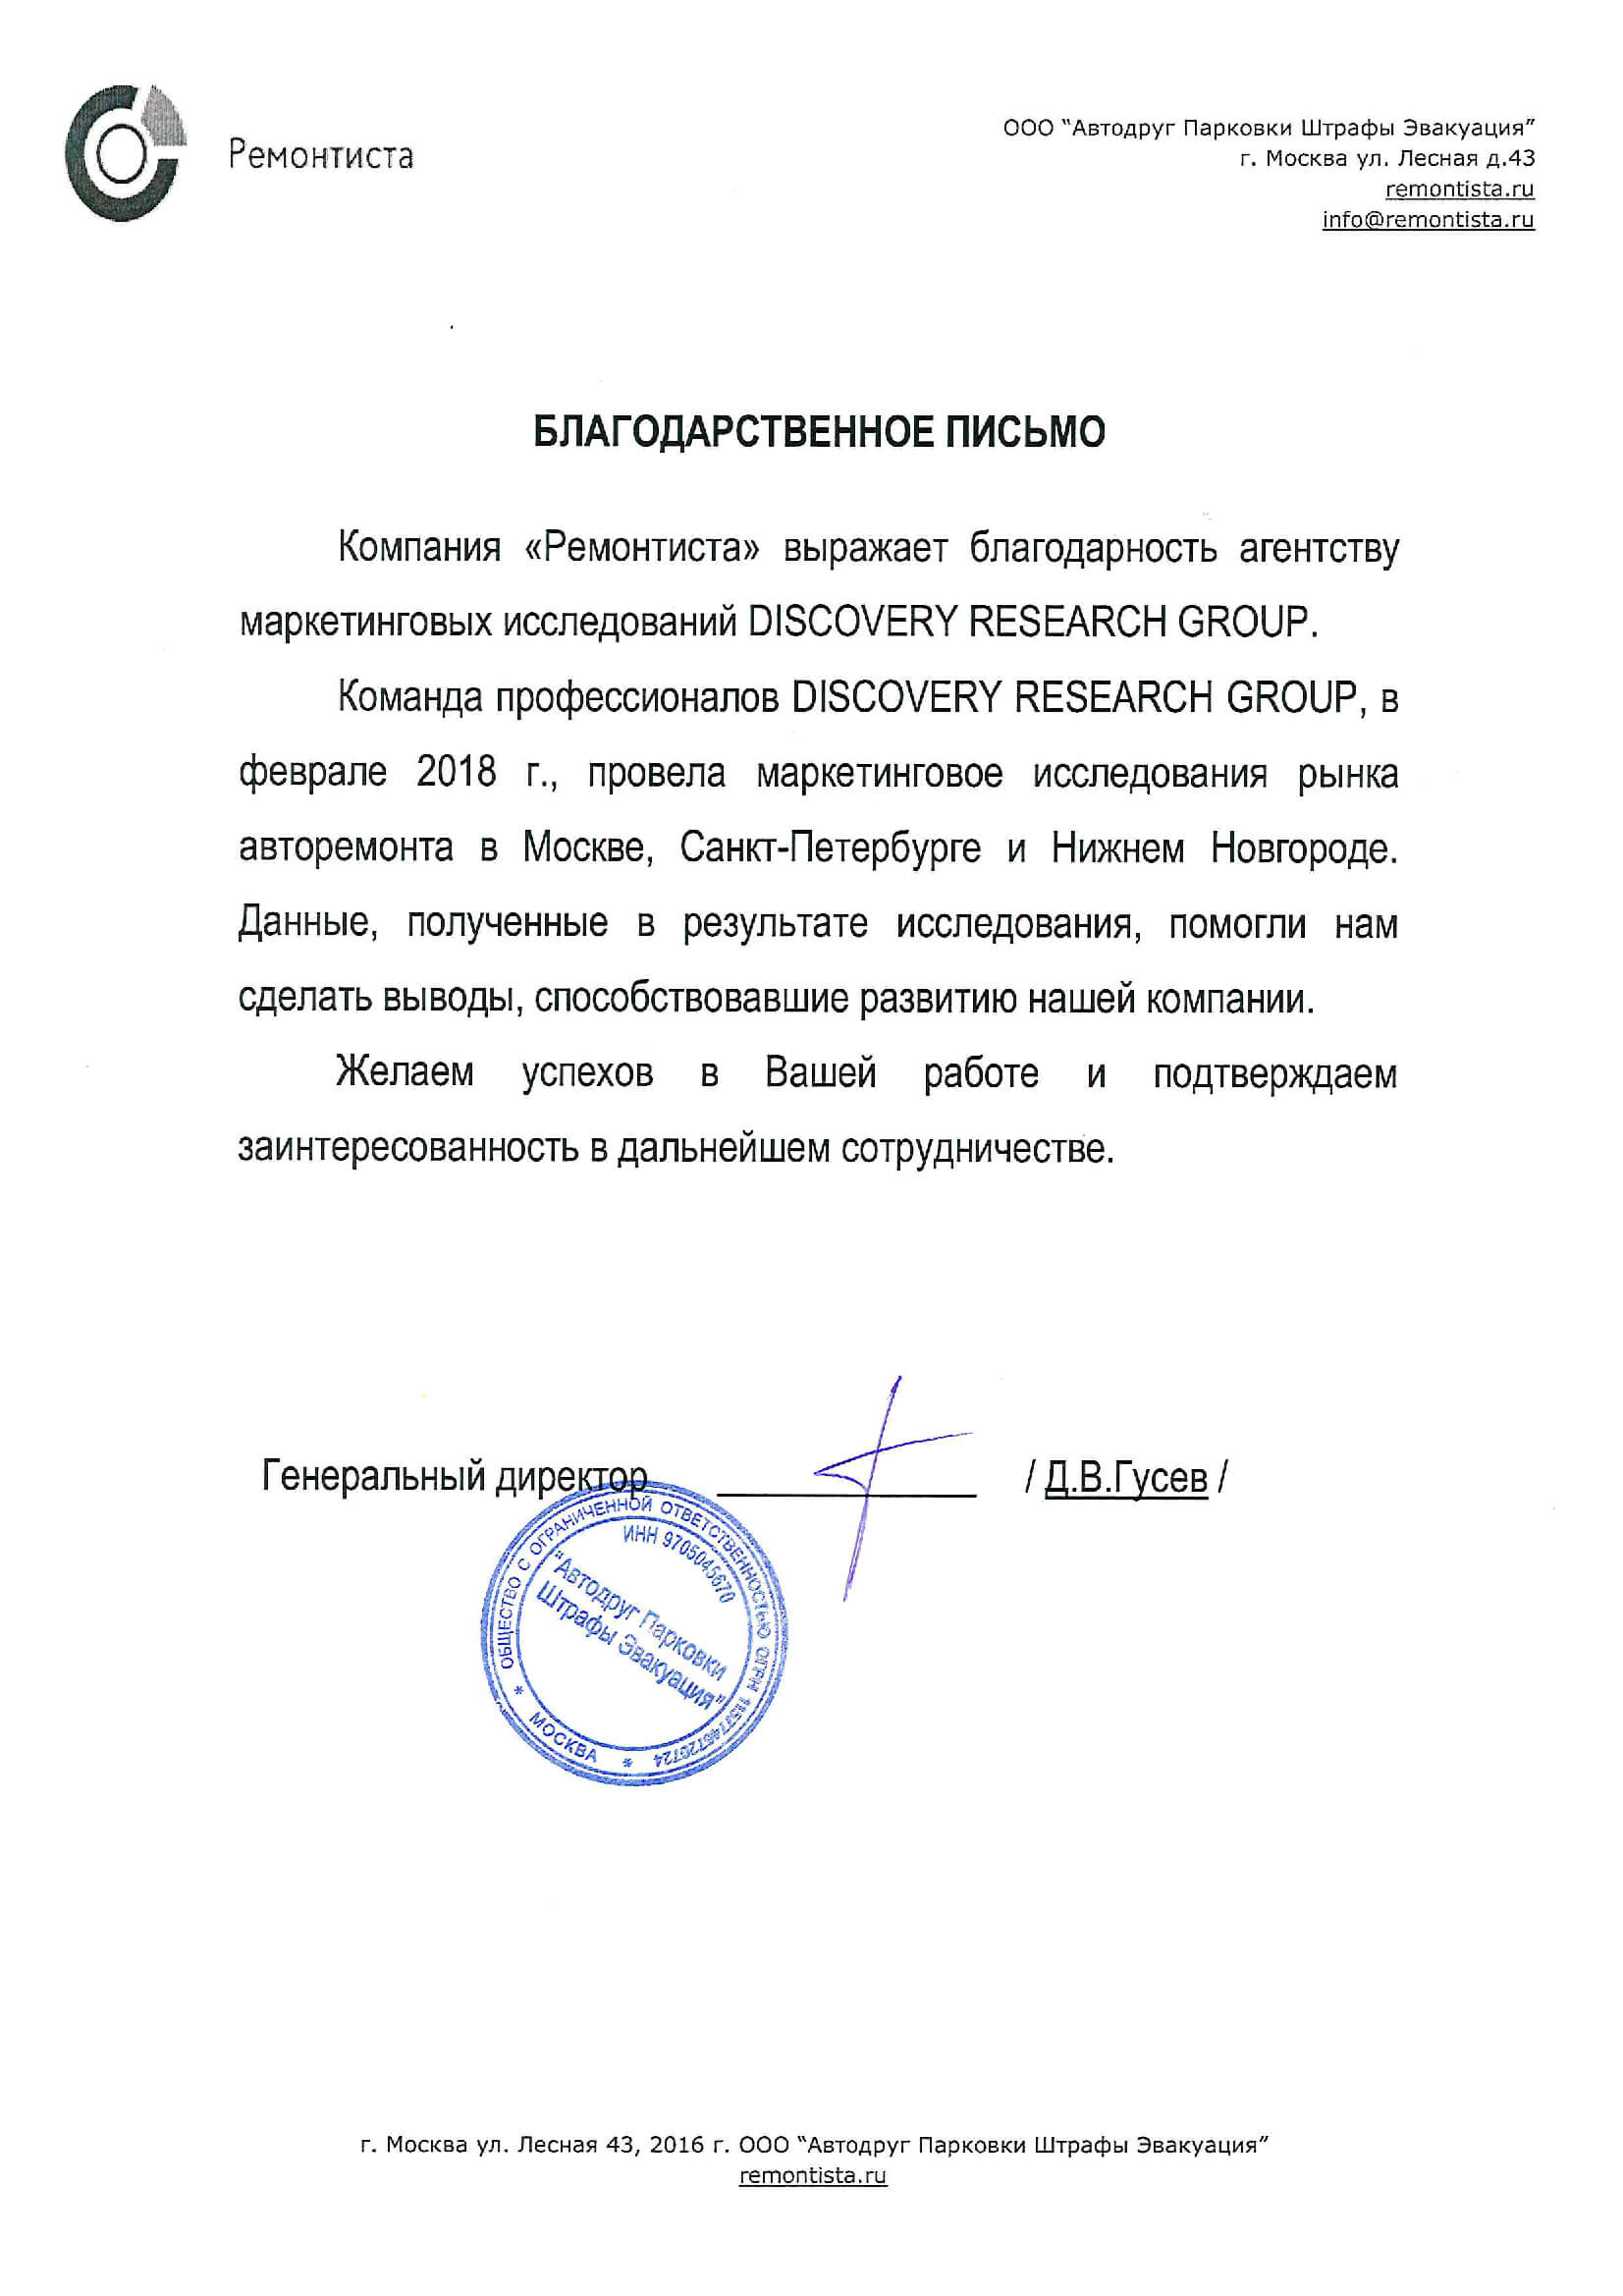 http://drgroup.ru/images/otzivi/remontista.jpg